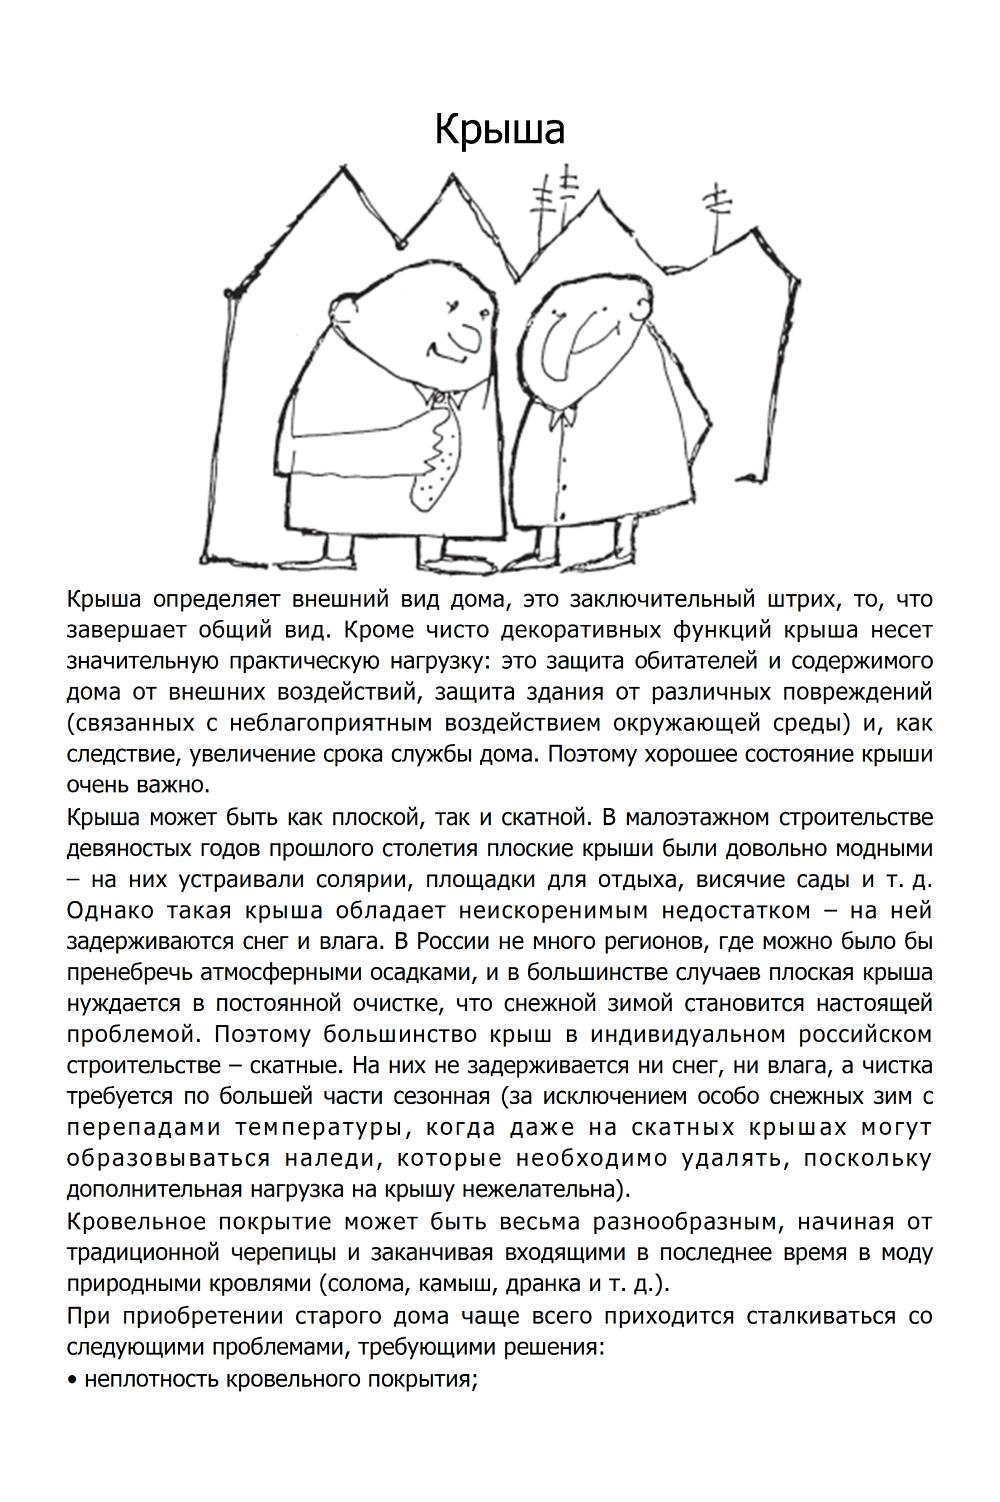 http://i5.imageban.ru/out/2013/12/03/d5c323e4cfe128c0e77424c31bfdcd2c.jpg